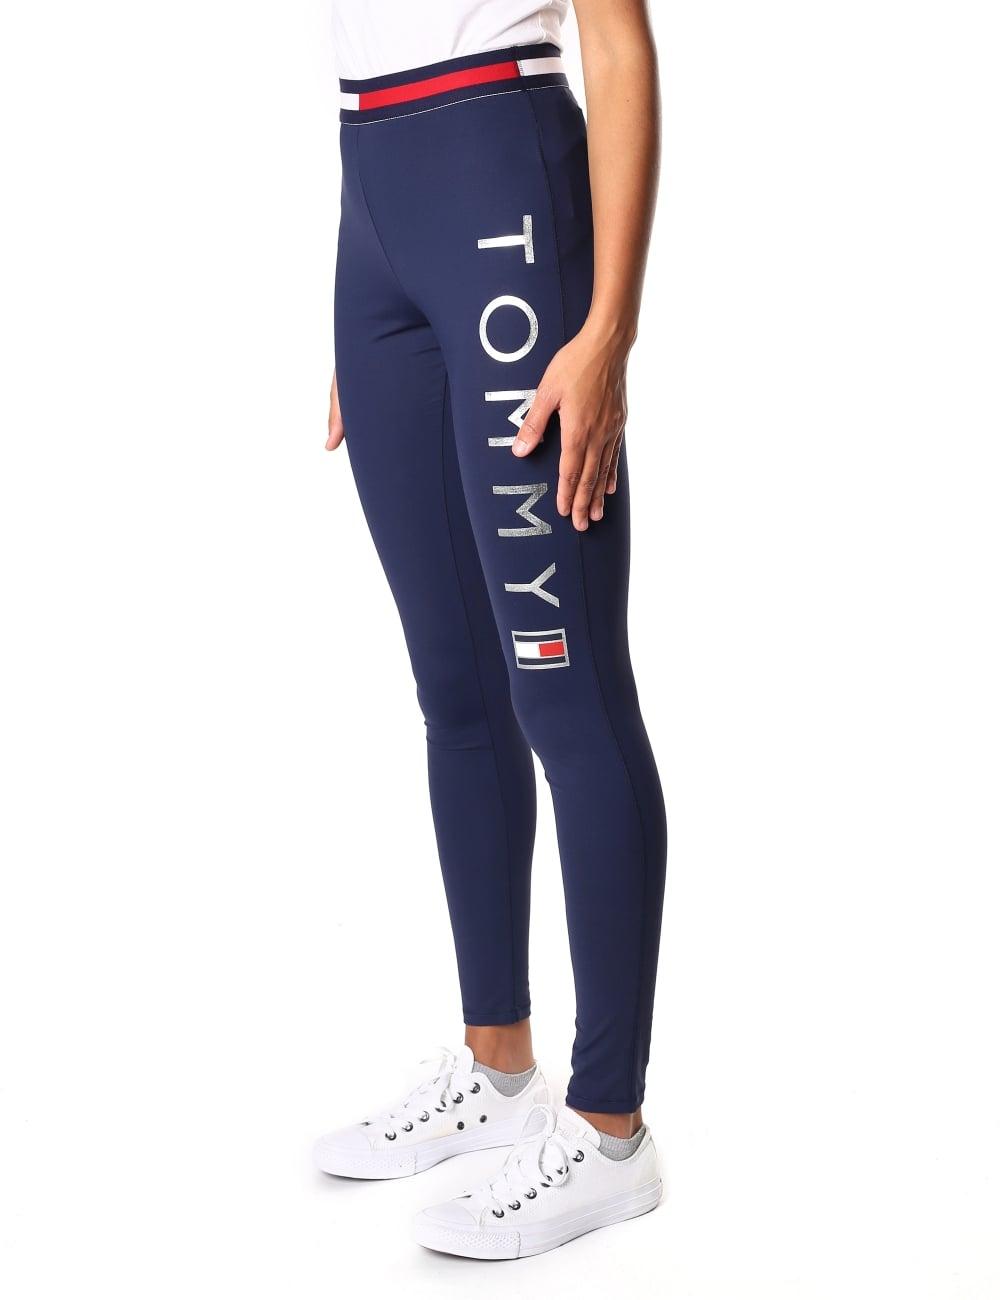 bea461bb Tommy Hilfiger Women's Athletic Tiffany Logo Legging